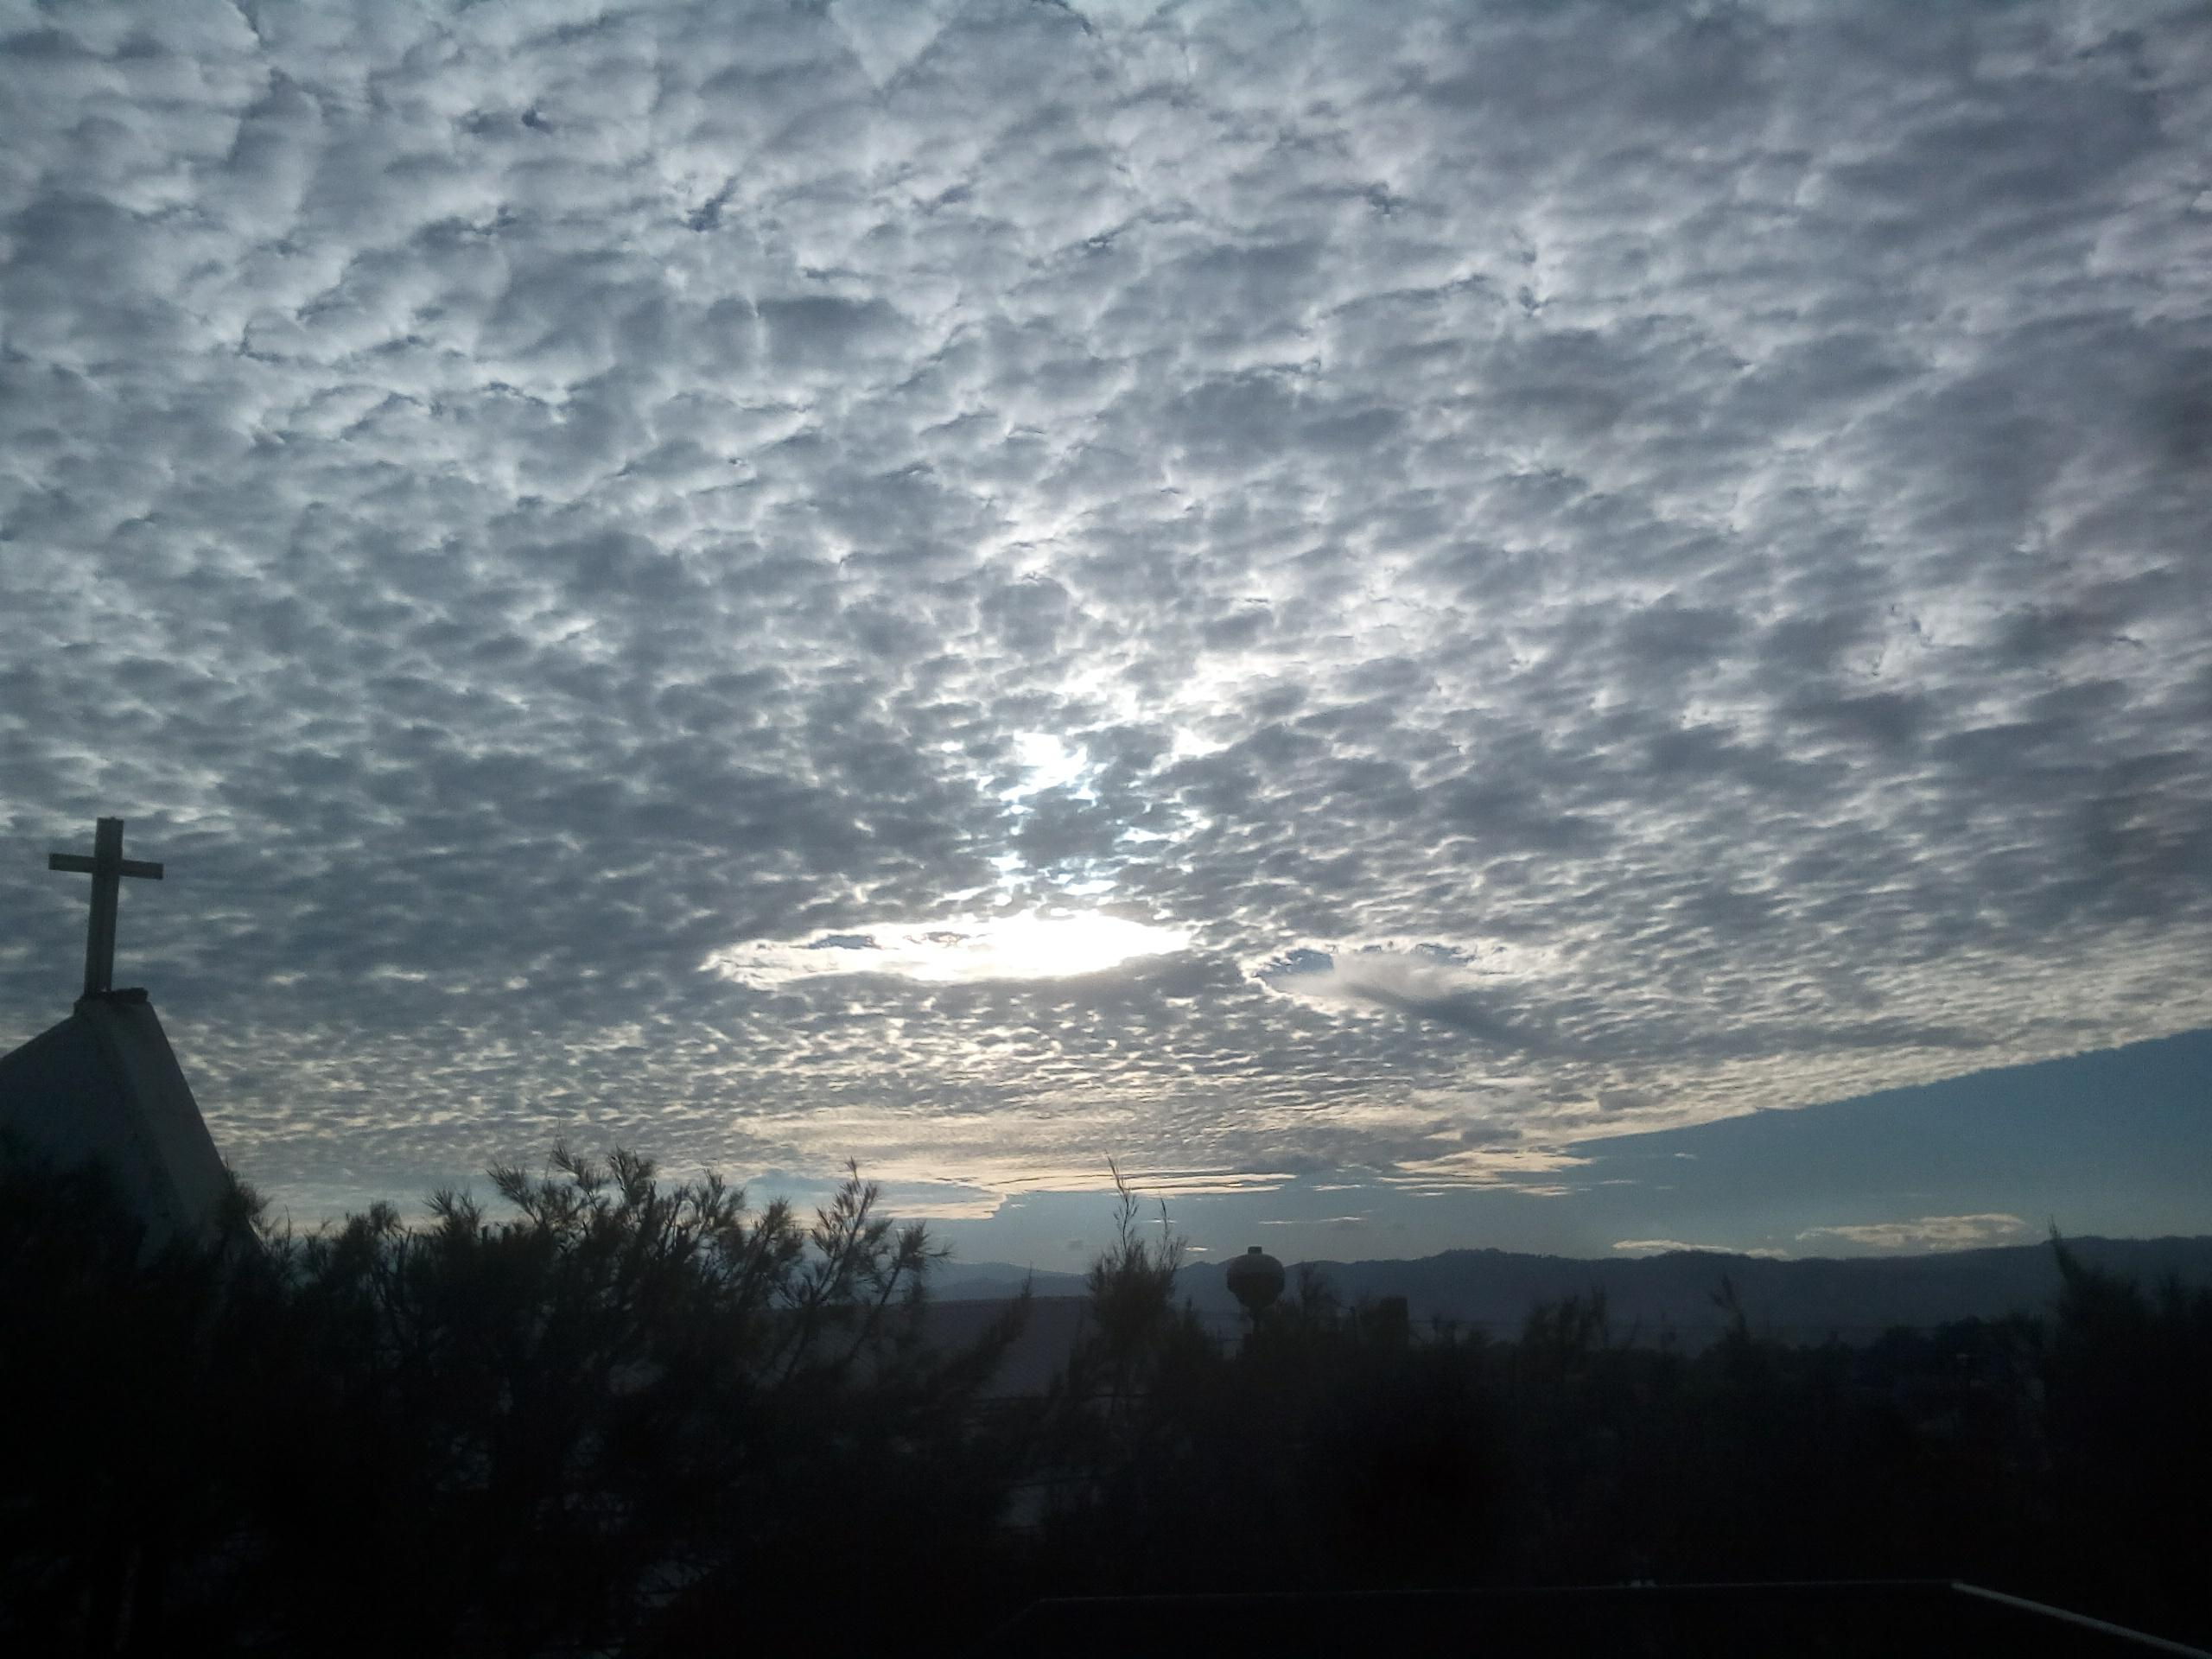 Nubes cirrus EU Emisoras Unidas Guatemala